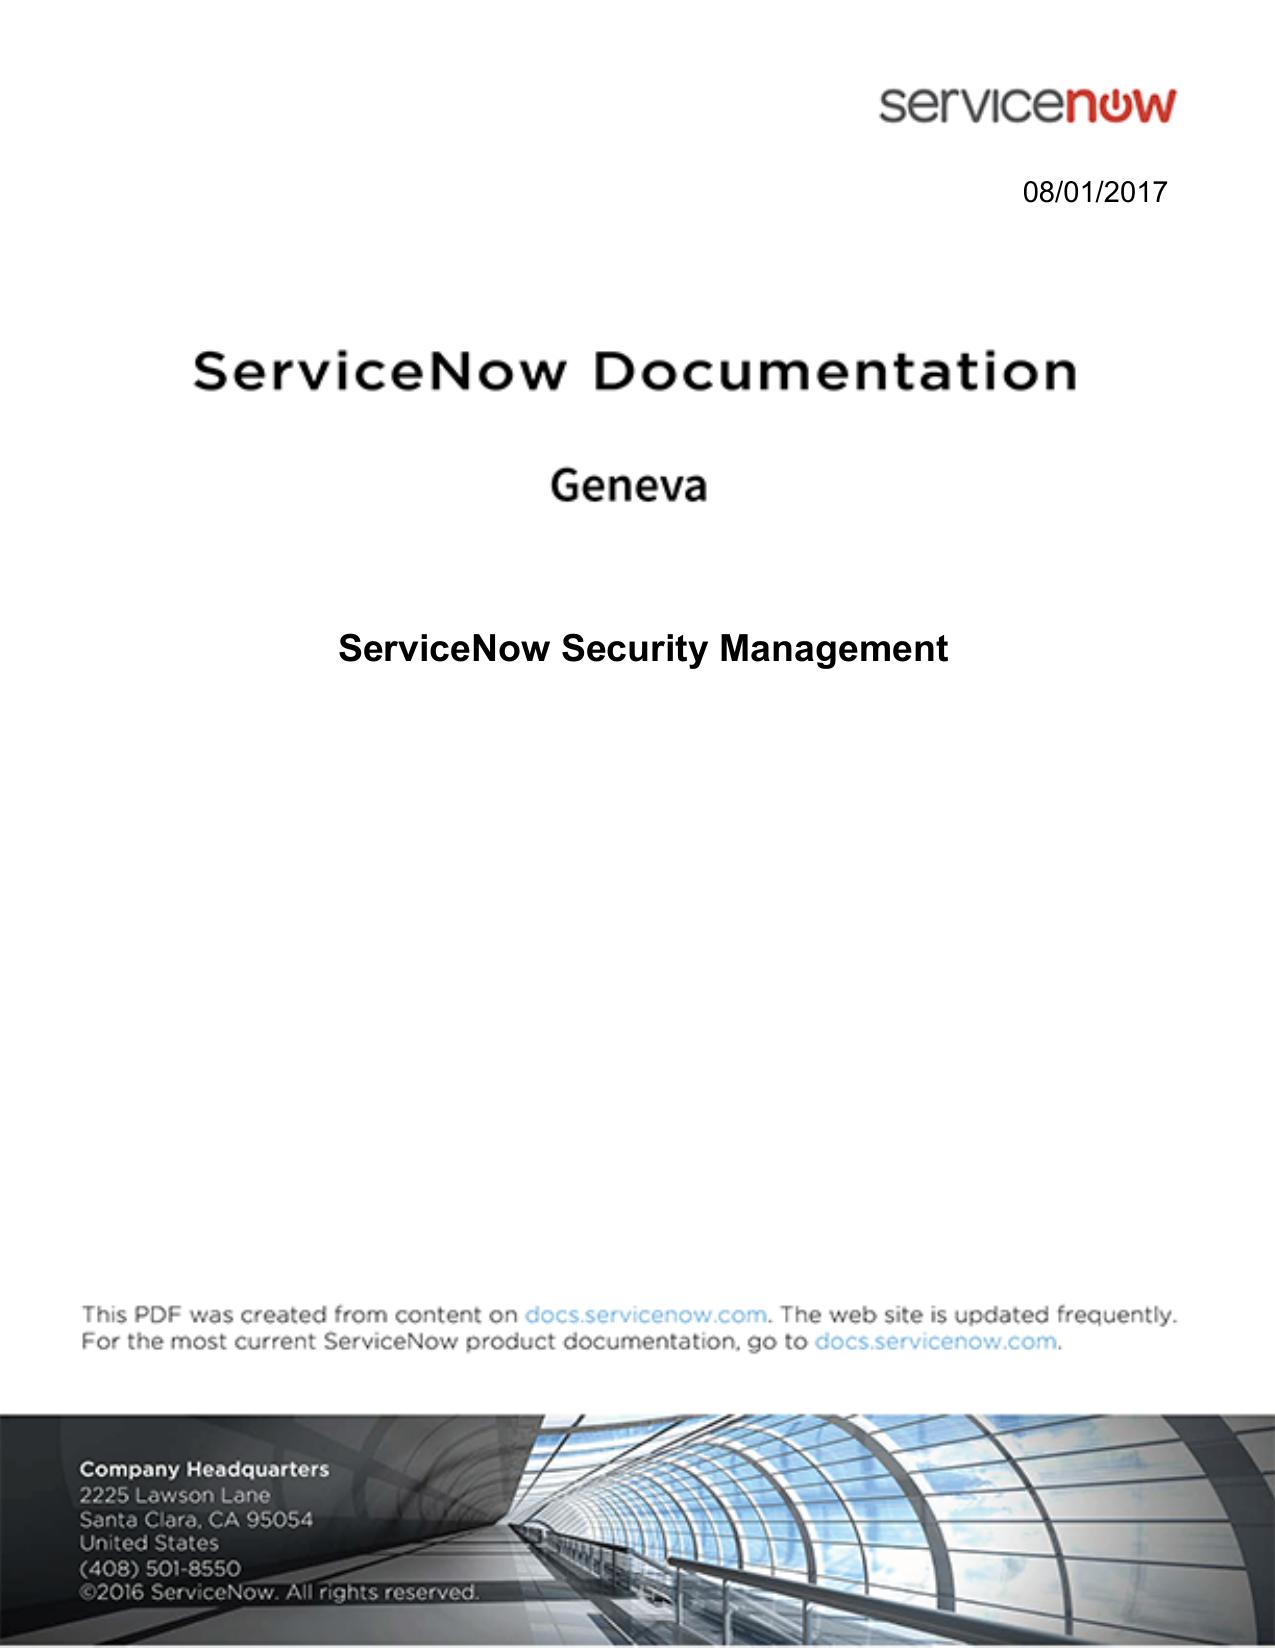 ServiceNow Security Management | manualzz com